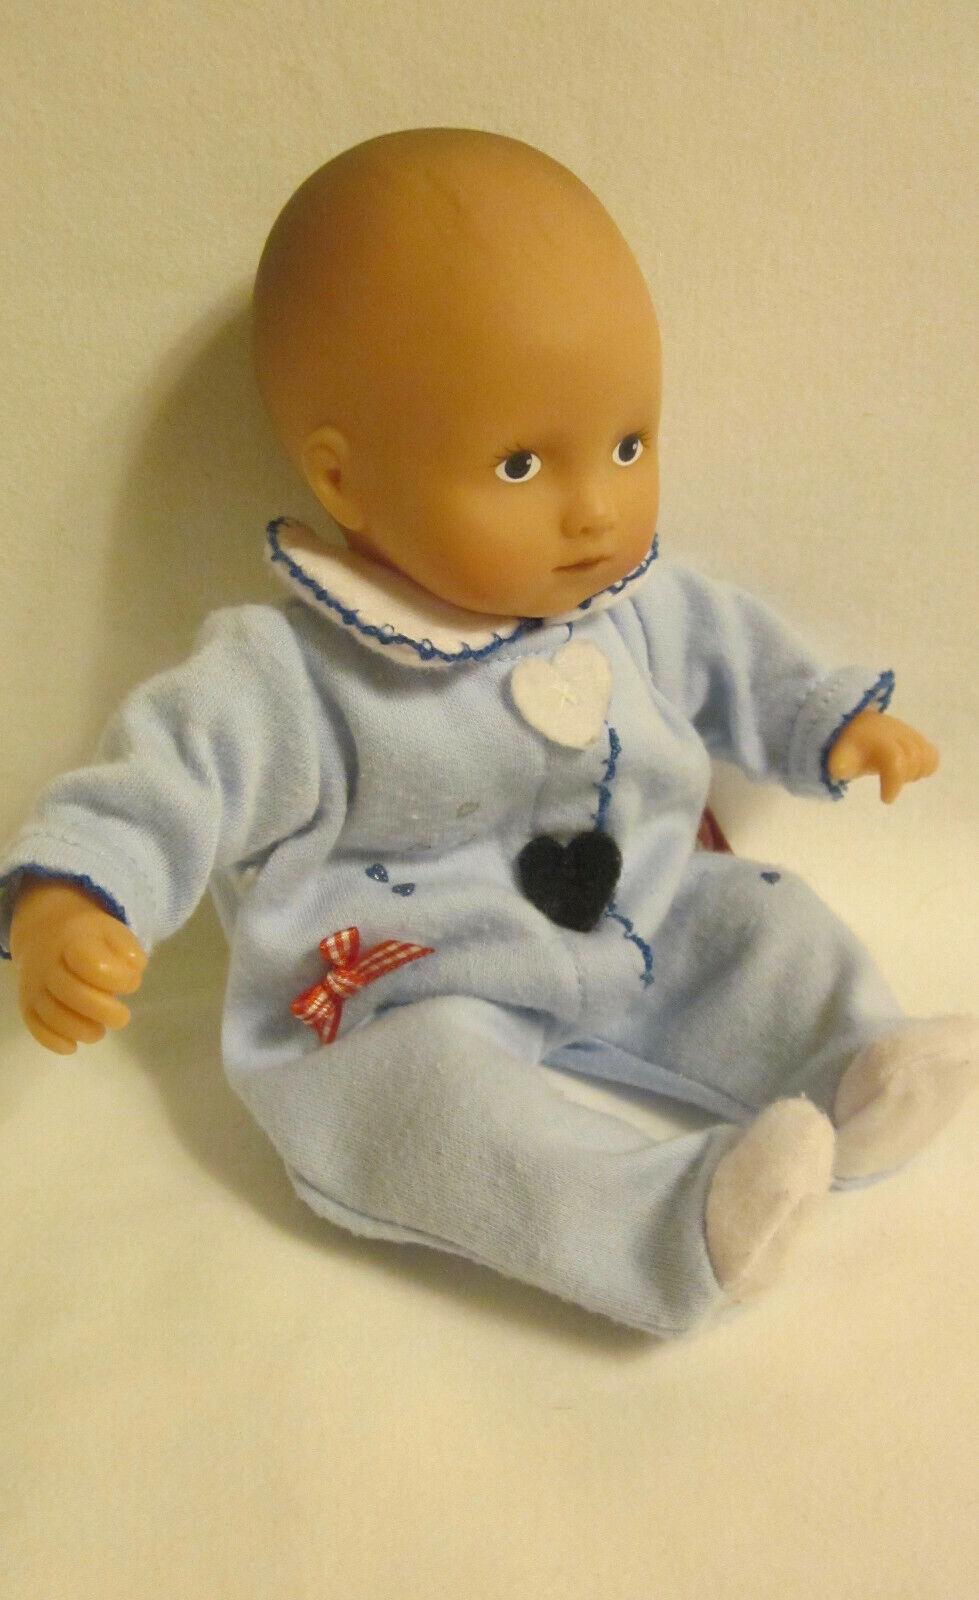 GOTZ MINI BABY DOLL, 9 , VINYL W/CLOTH BODY, WEARING ORIGINAL VERY CUTE SLEEPER - $11.99